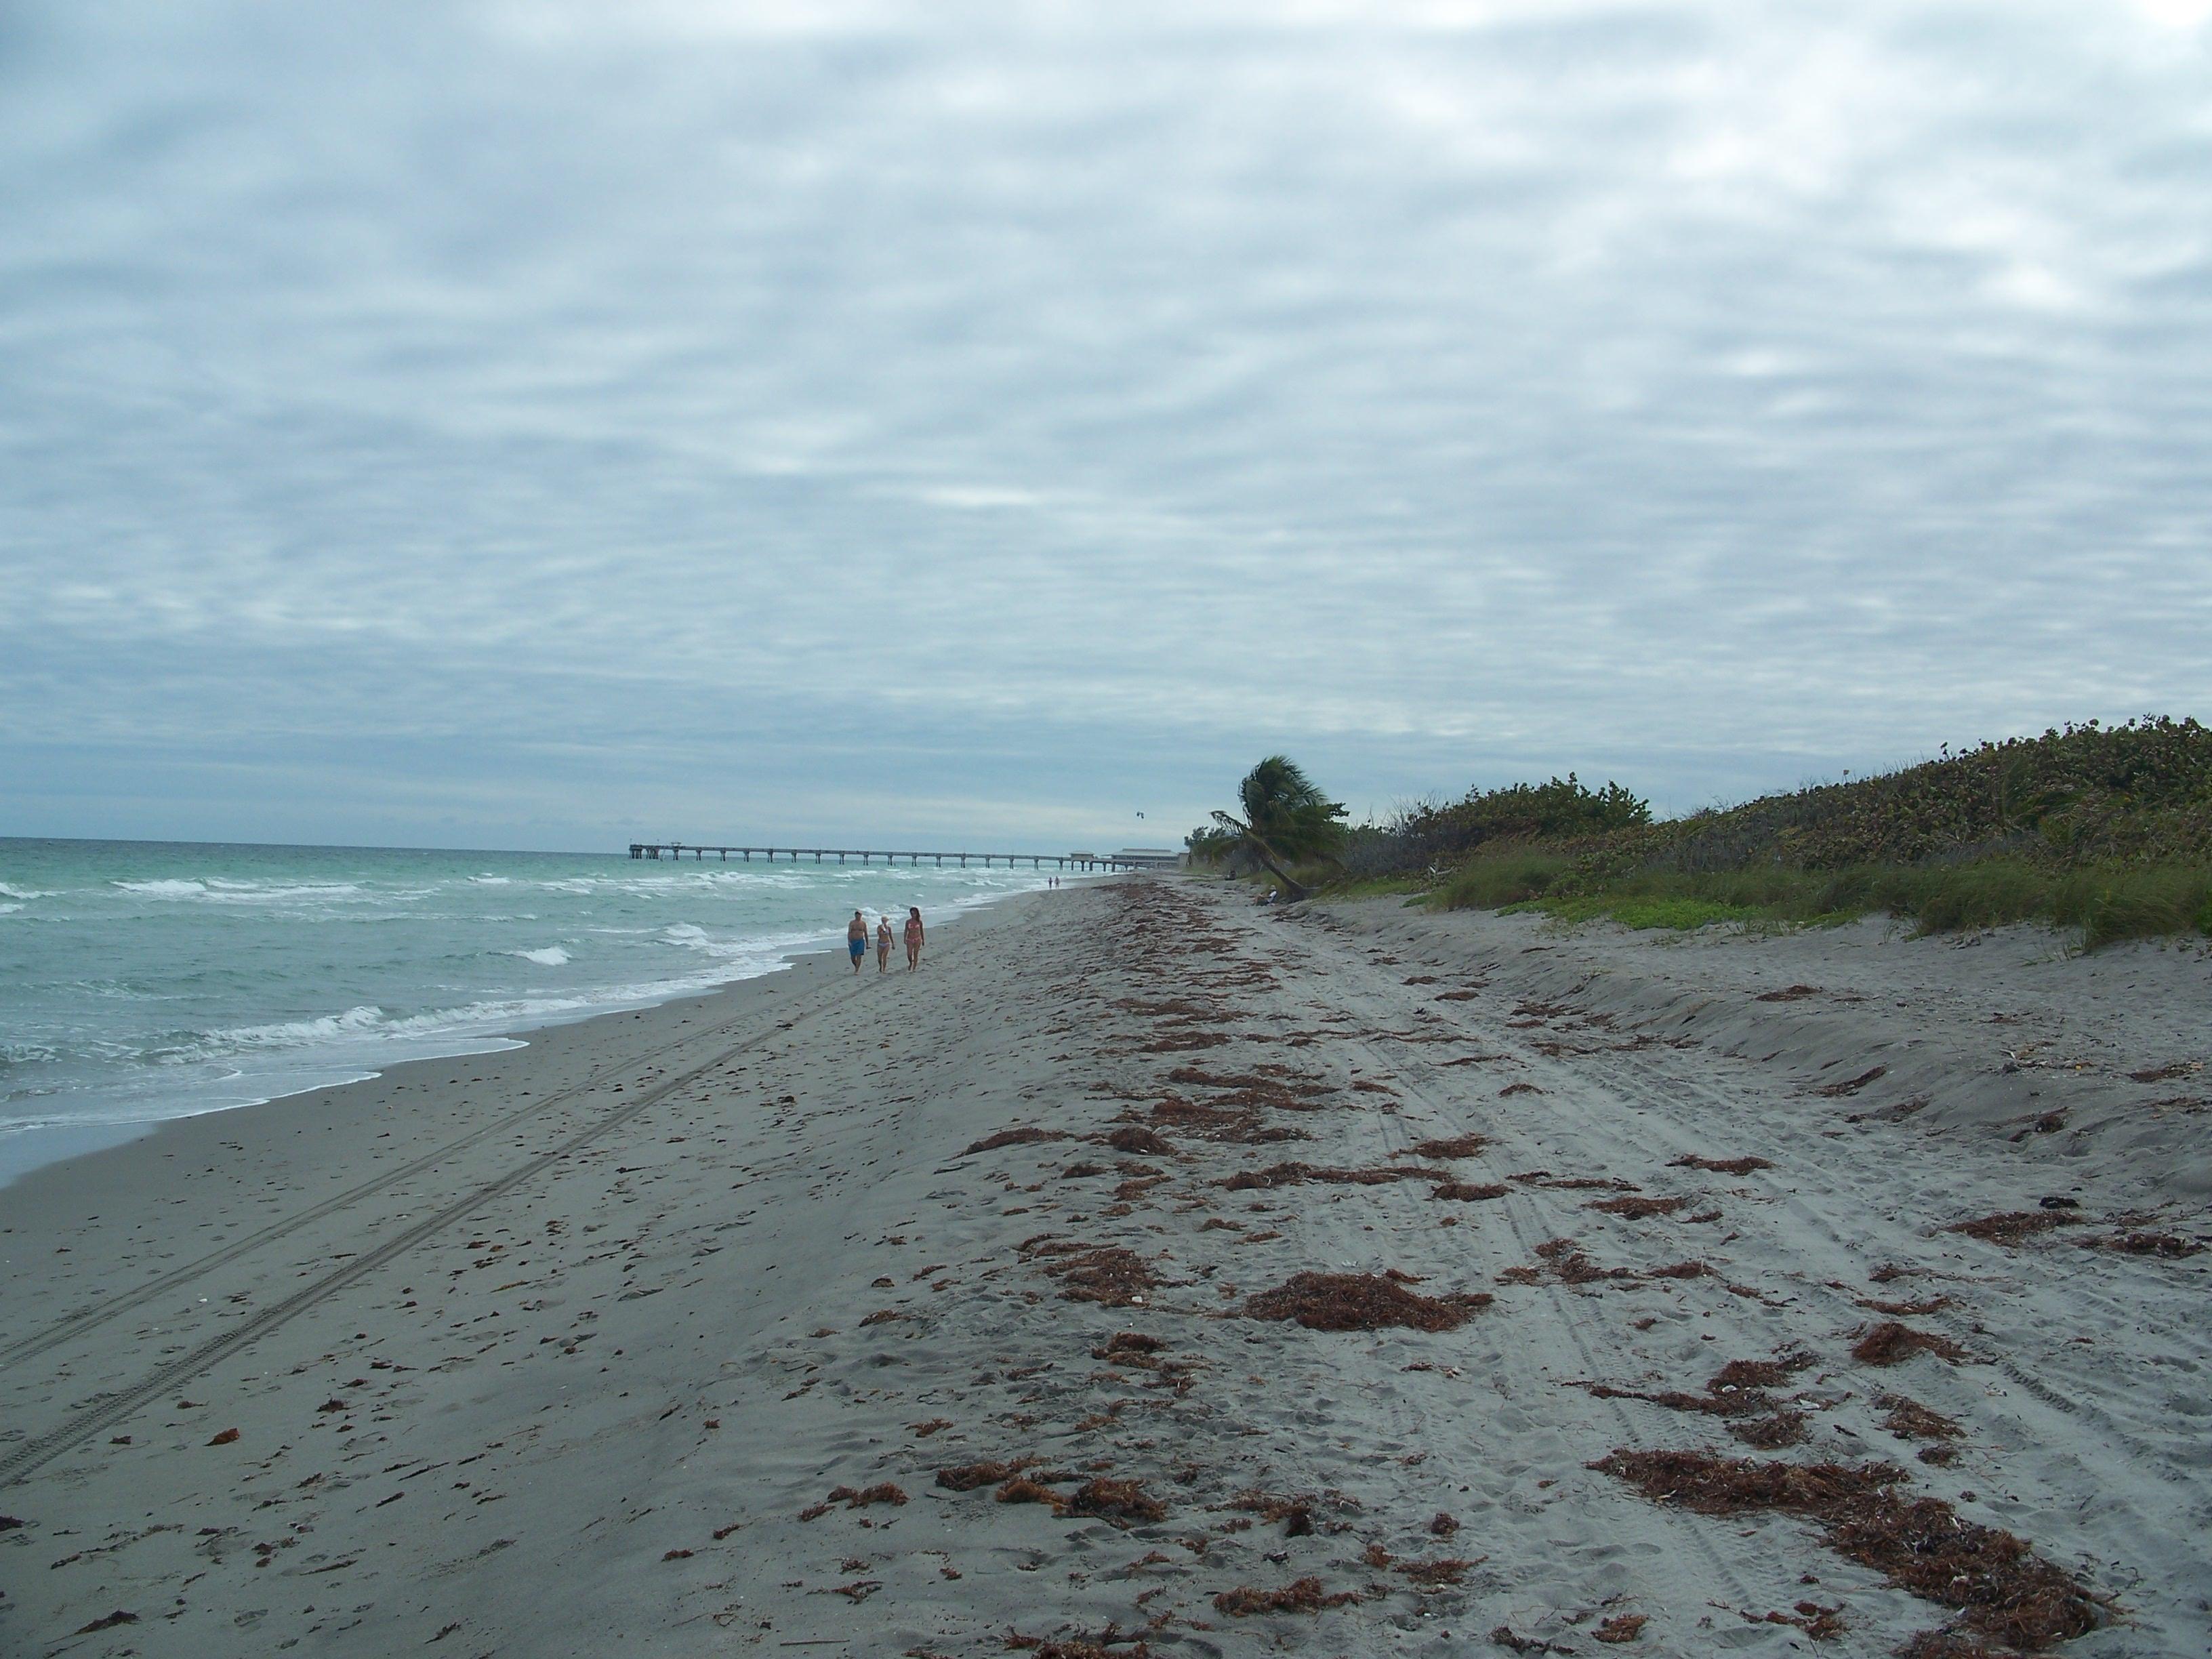 Dania Beach State Park